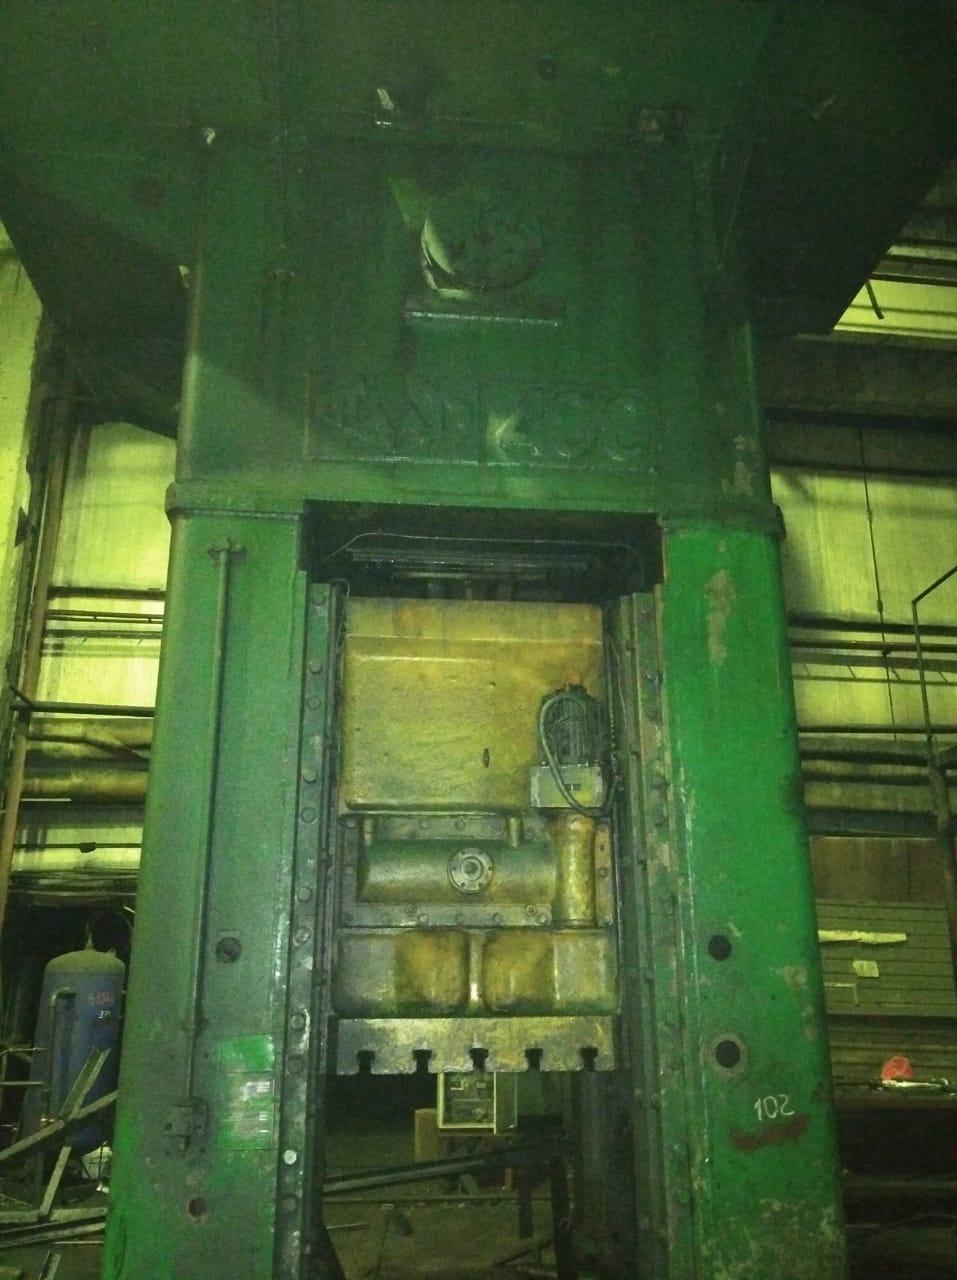 Trimming press VORONEZH KA 9536 400 TON